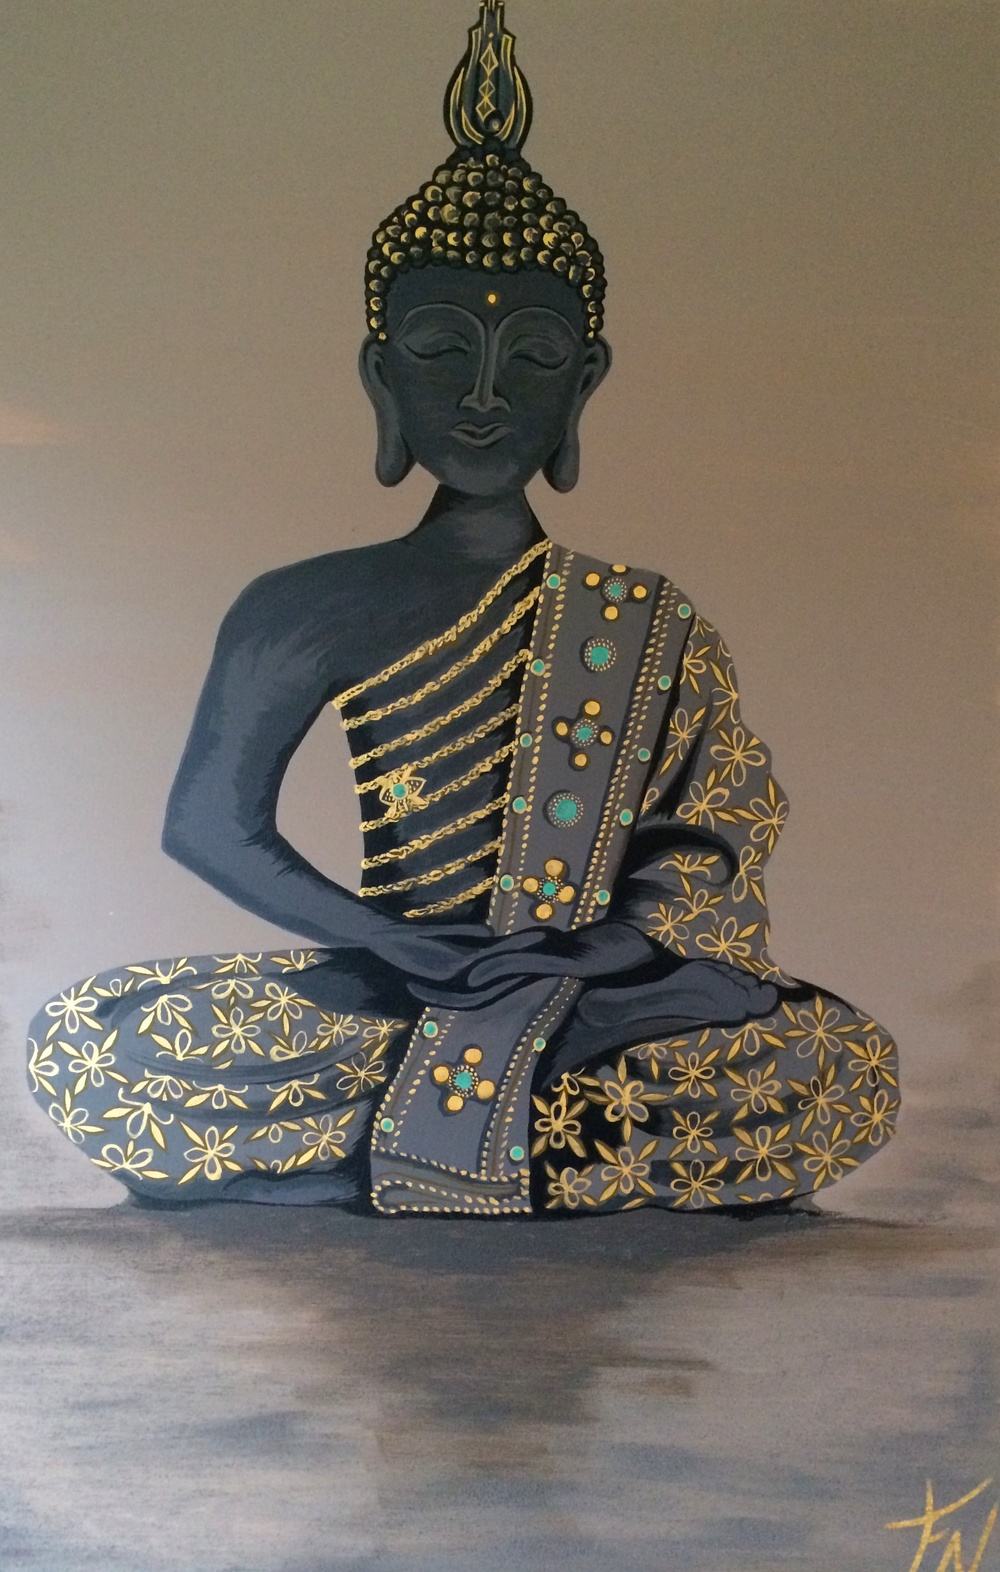 Thai Boeddha 120x80cm Contact Feike for pricing info